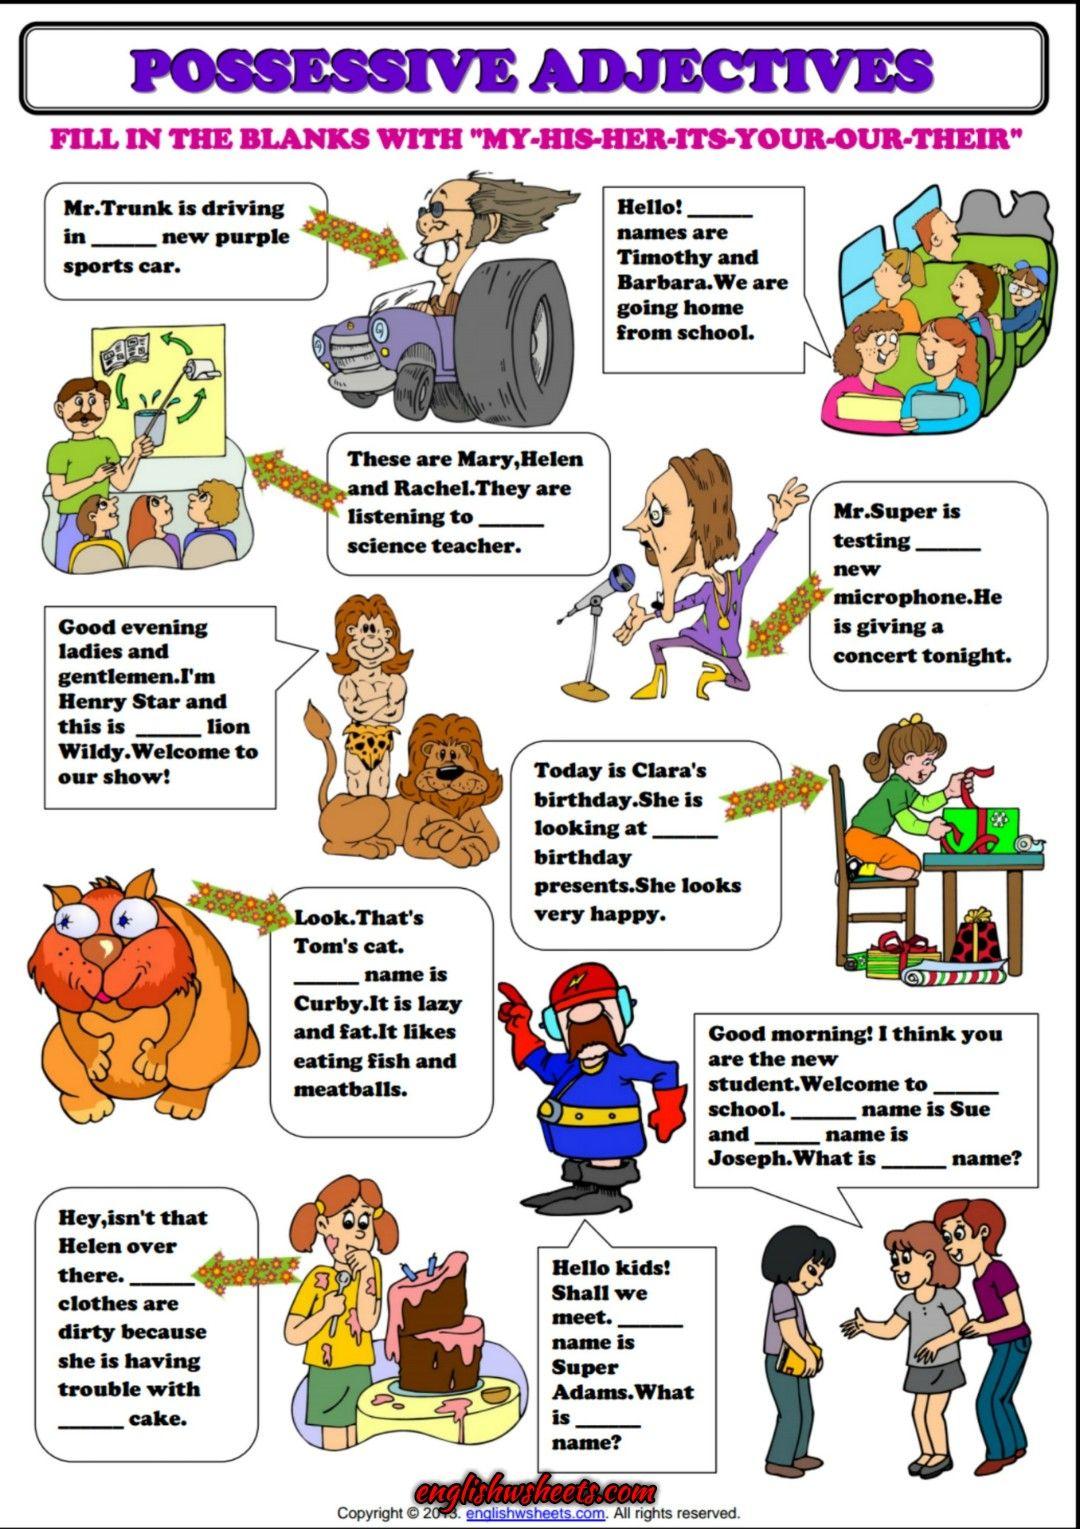 Possessive Adjectives ESL Grammar Exercise Worksheet | Esl Printable ...